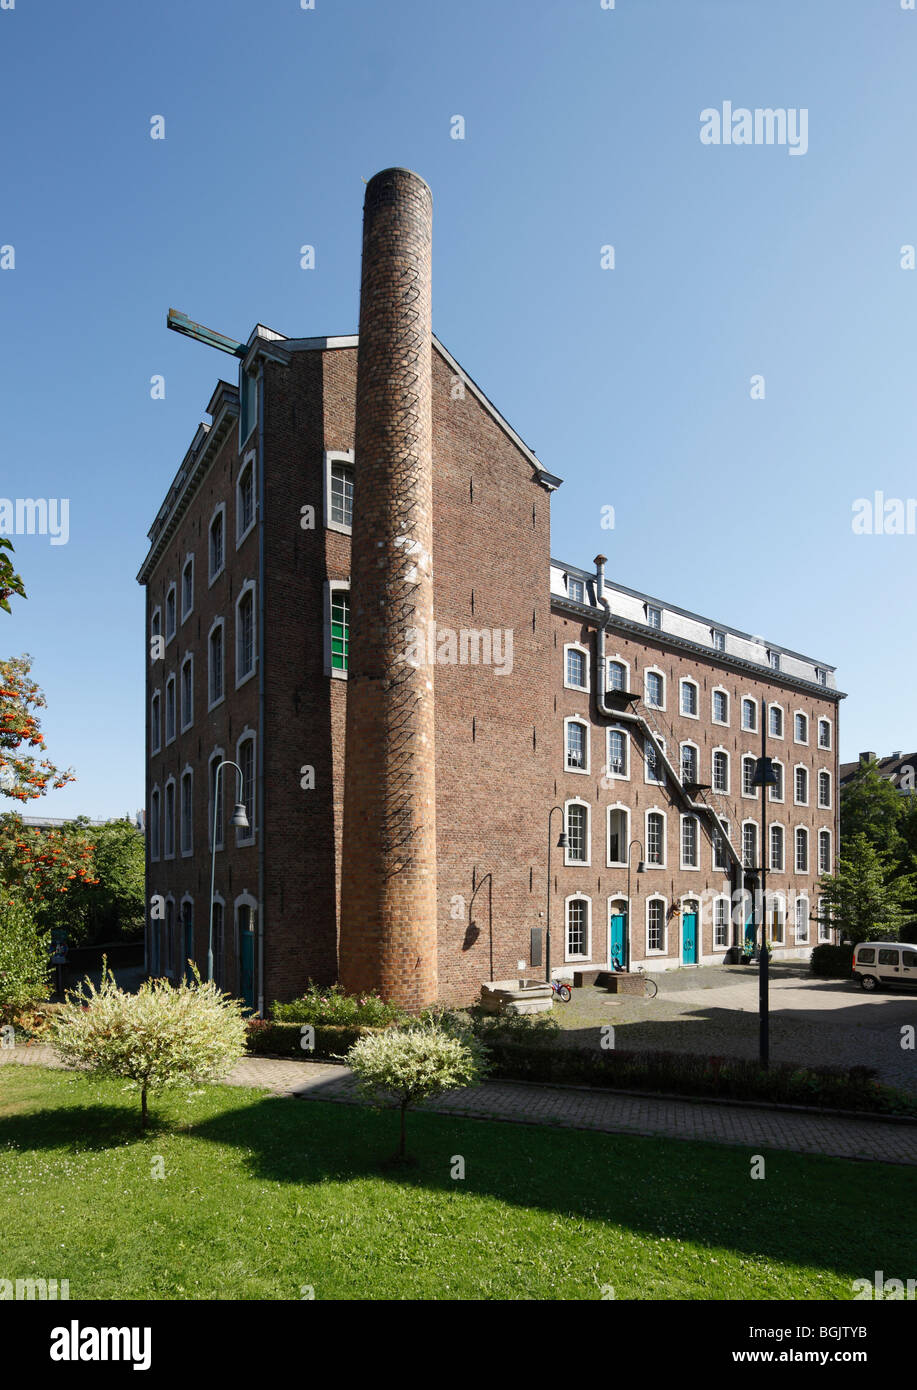 Aachen, Löhergraben 22, Barockfabrik, heute Kulturzentrum - Stock Image